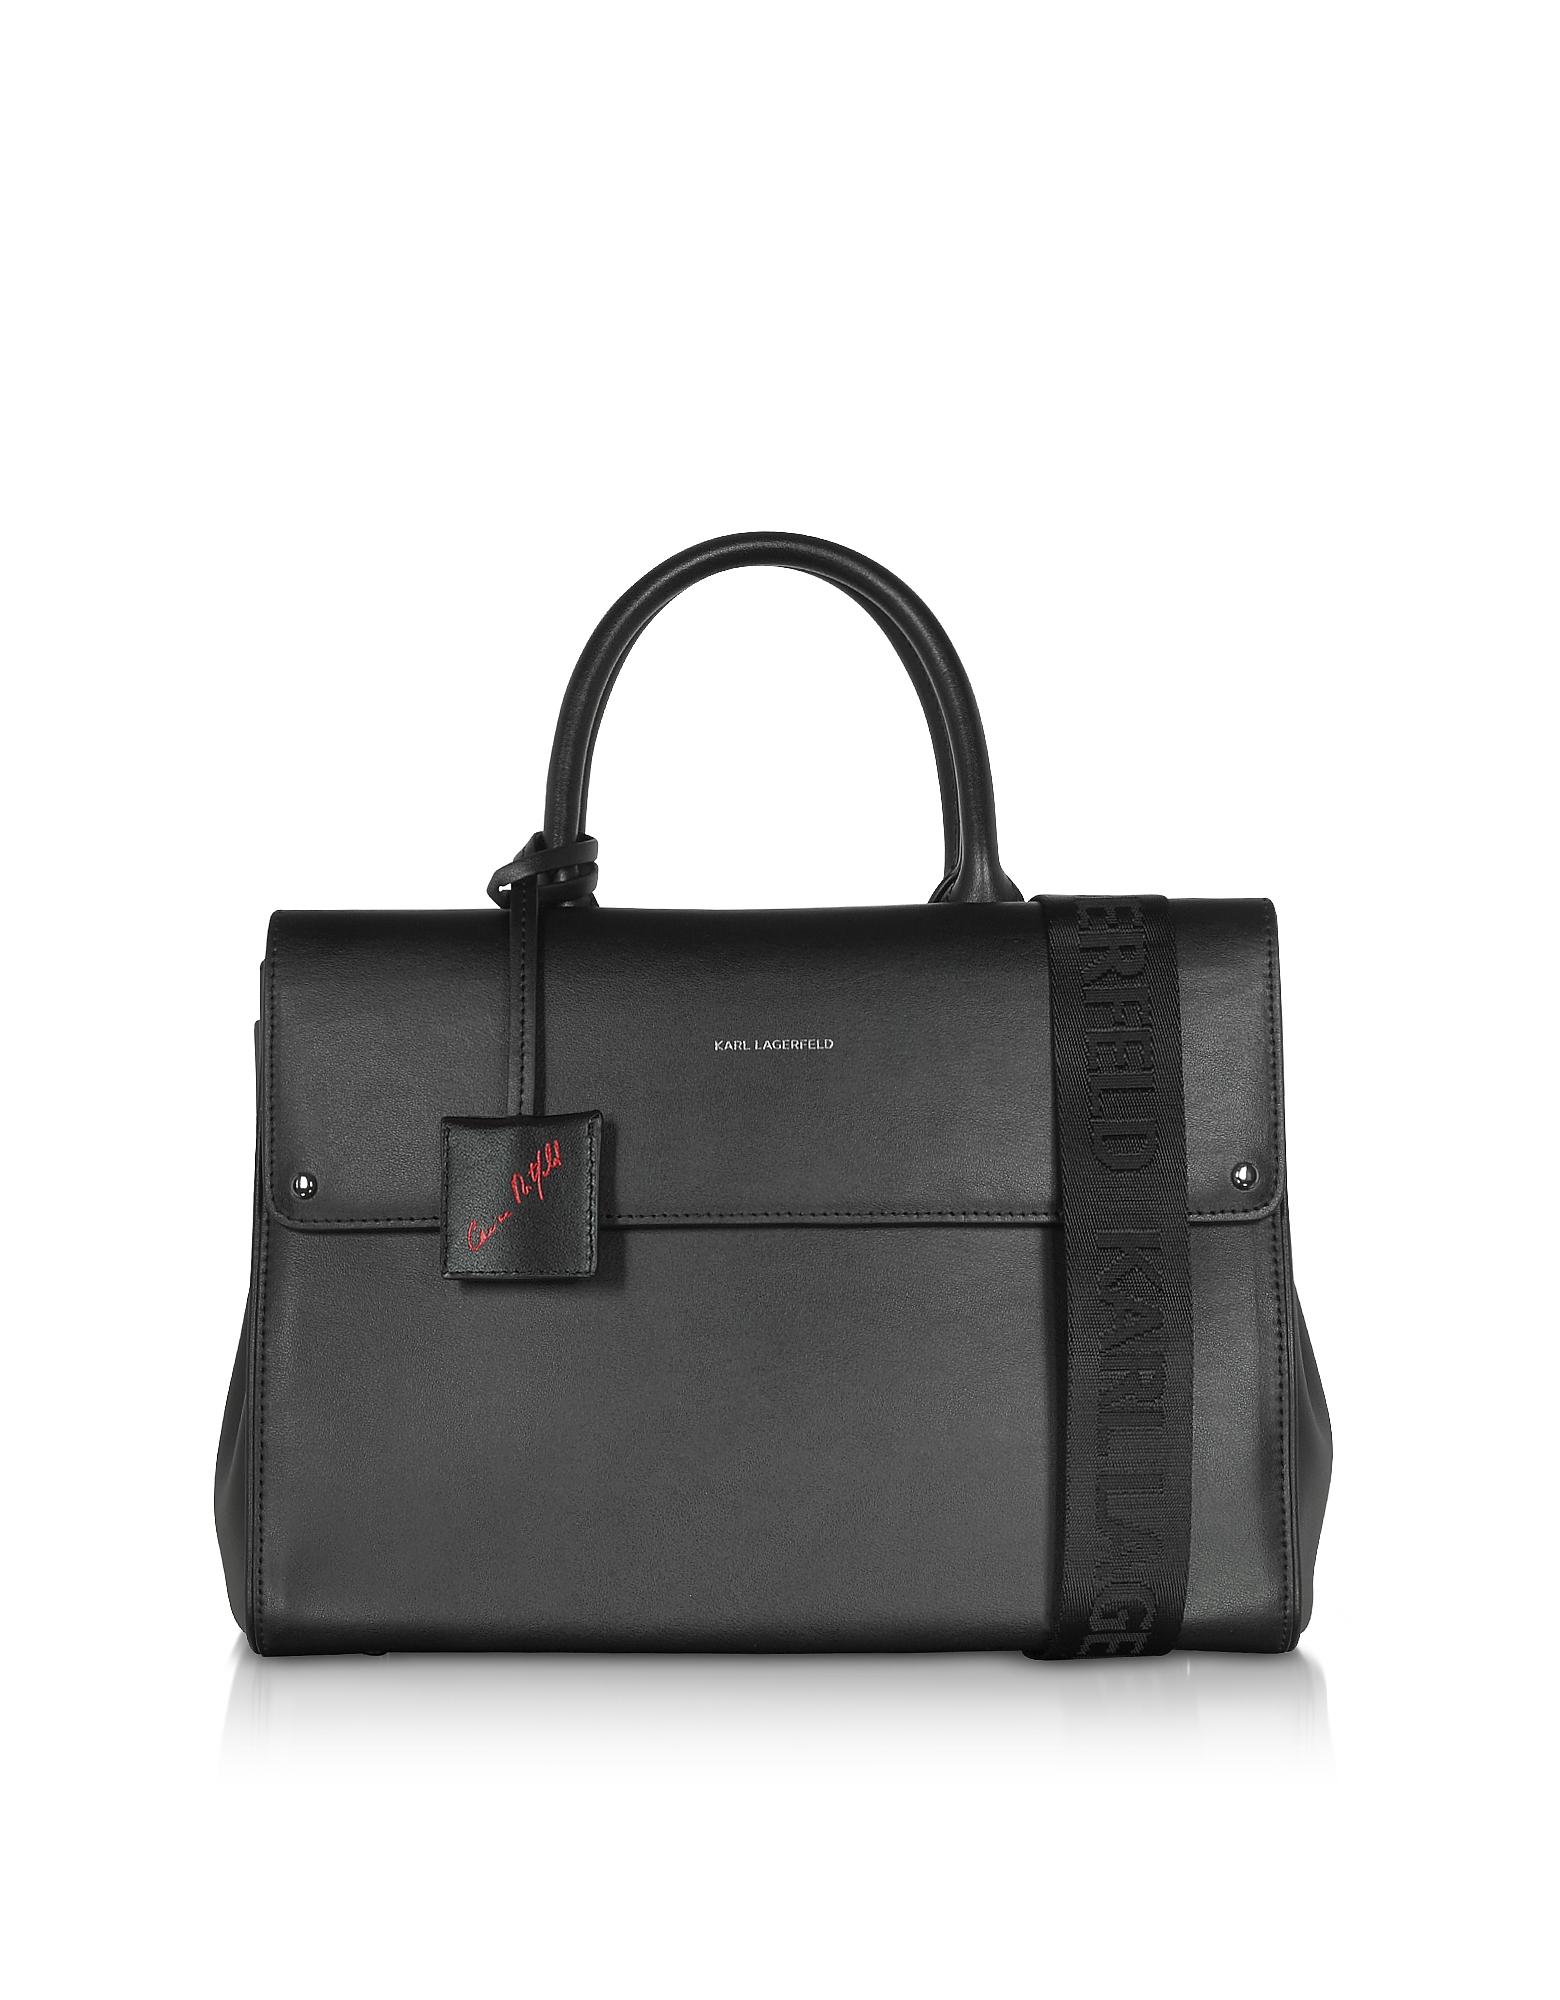 Karl Lagerfeld Designer Handbags, Carine X Karl Ikon Tote